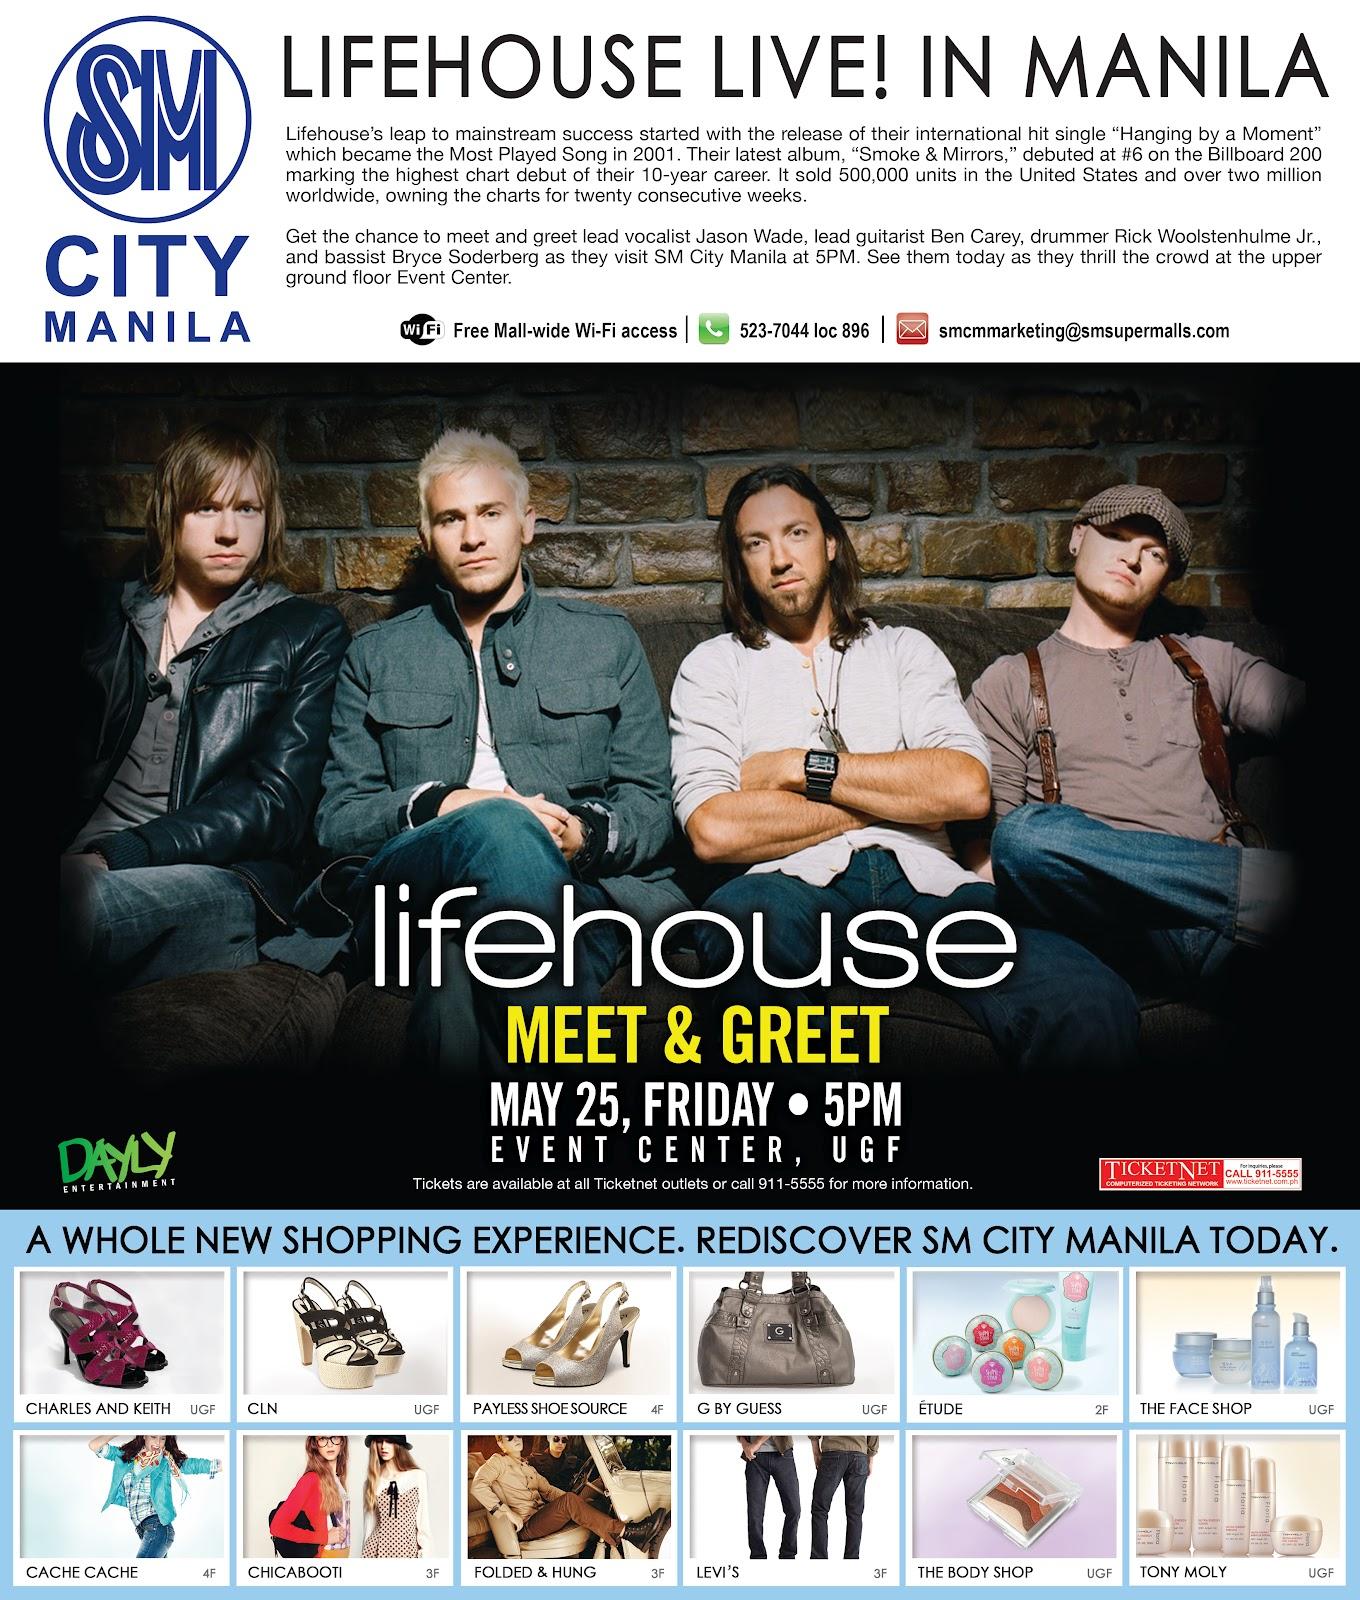 meet lifehouse